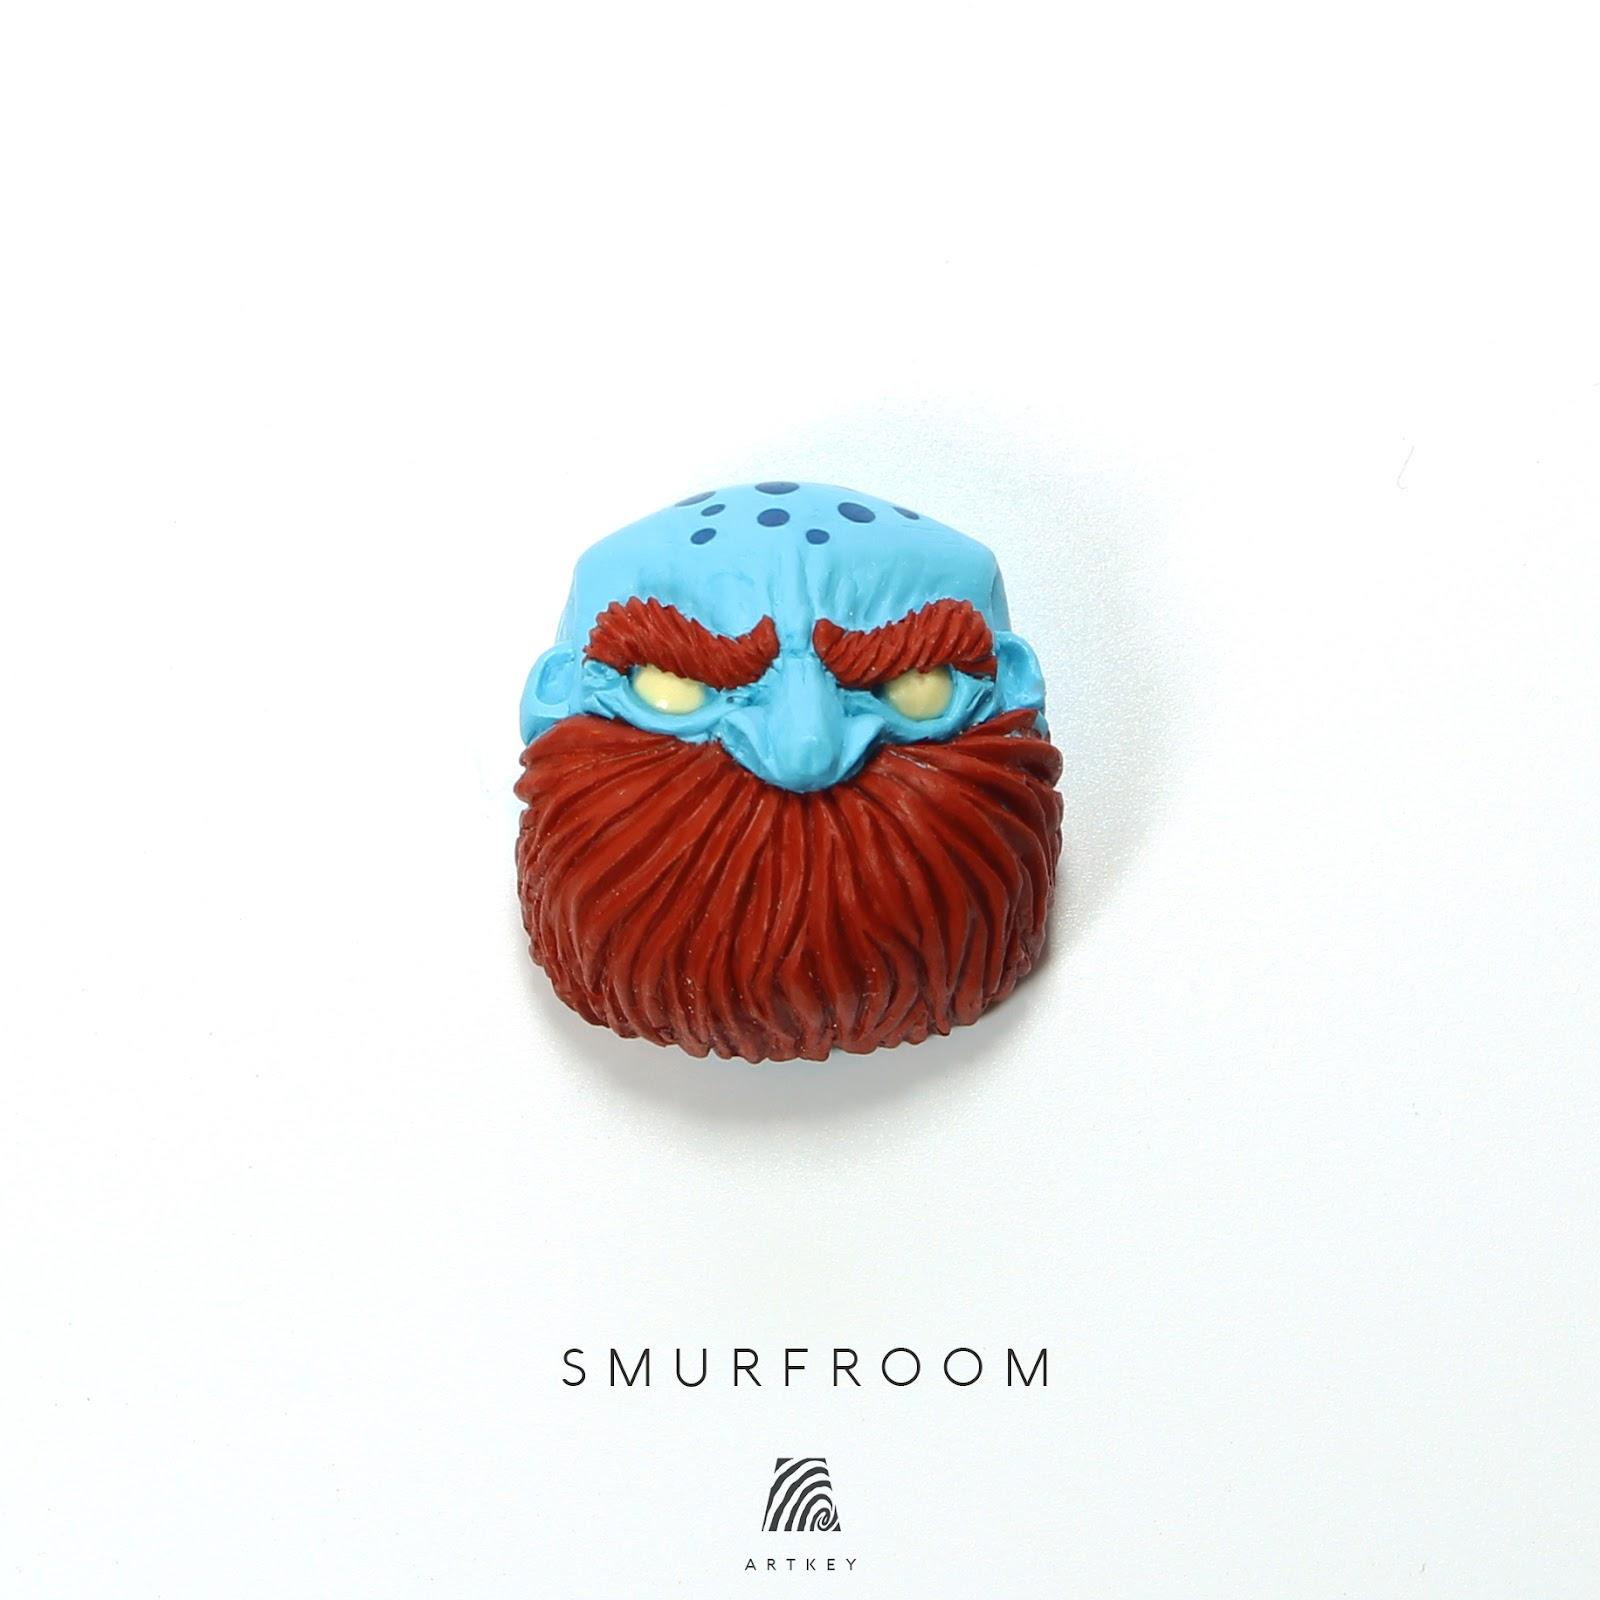 Artkey - Smurfroom Jack Bald